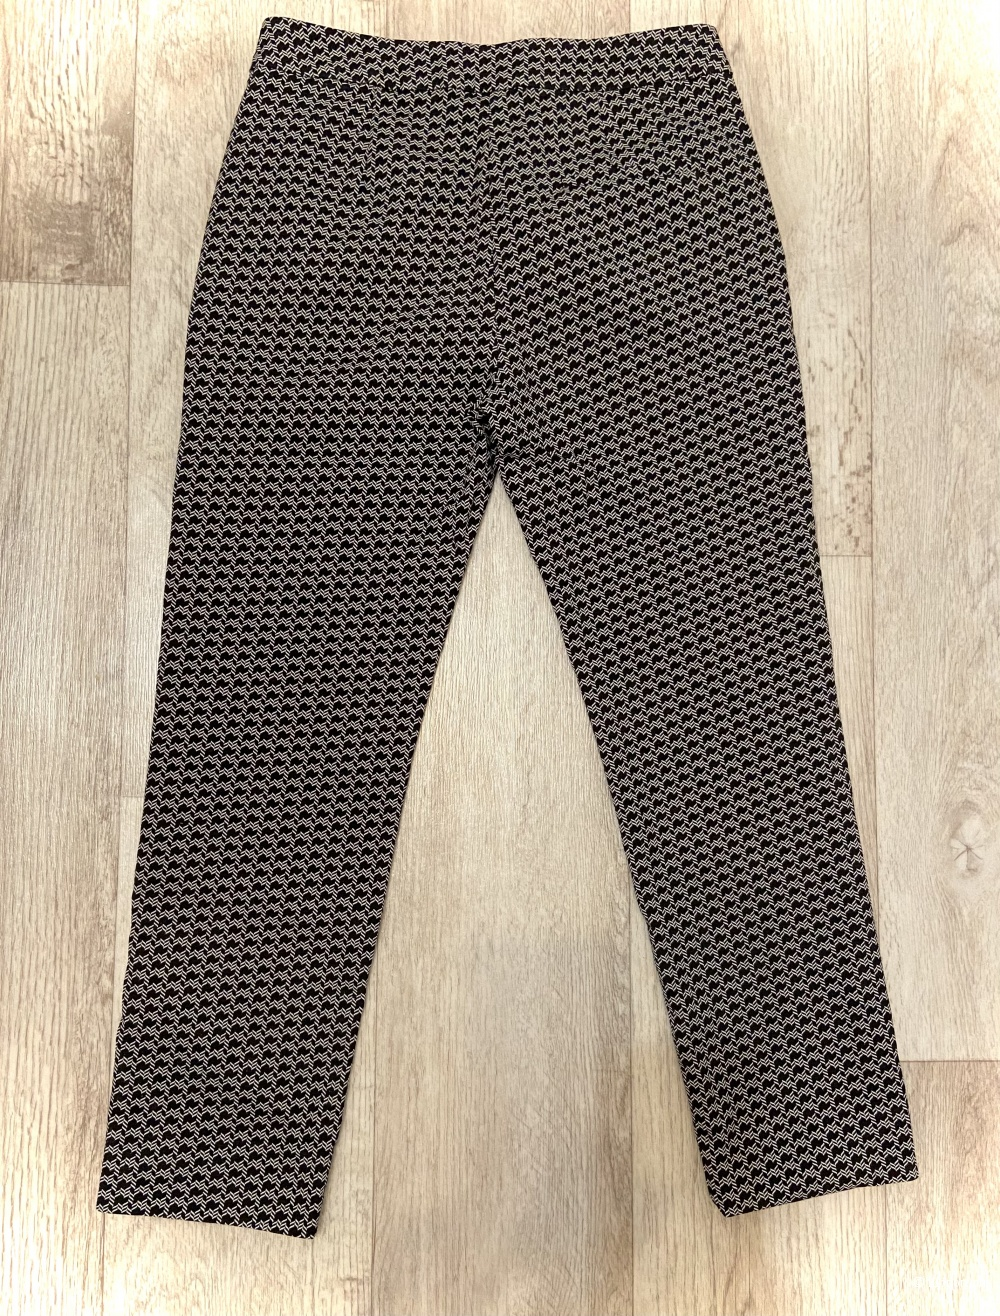 Max&Co брюки (Max Mara) M(44-46)